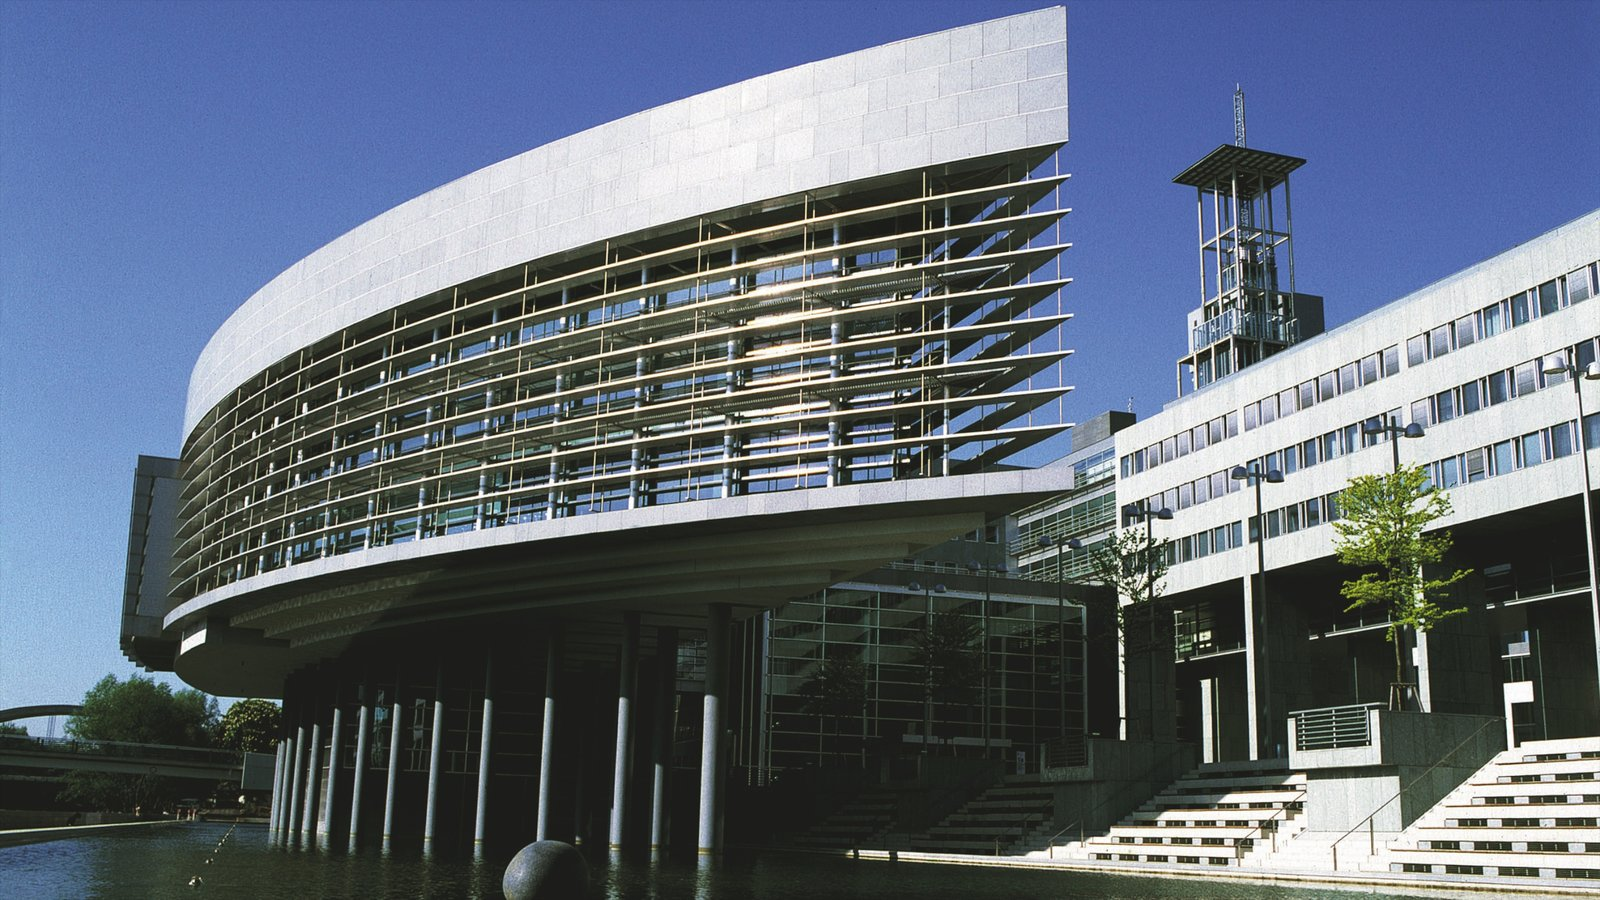 Sankt Pölten mostrando arquitectura moderna